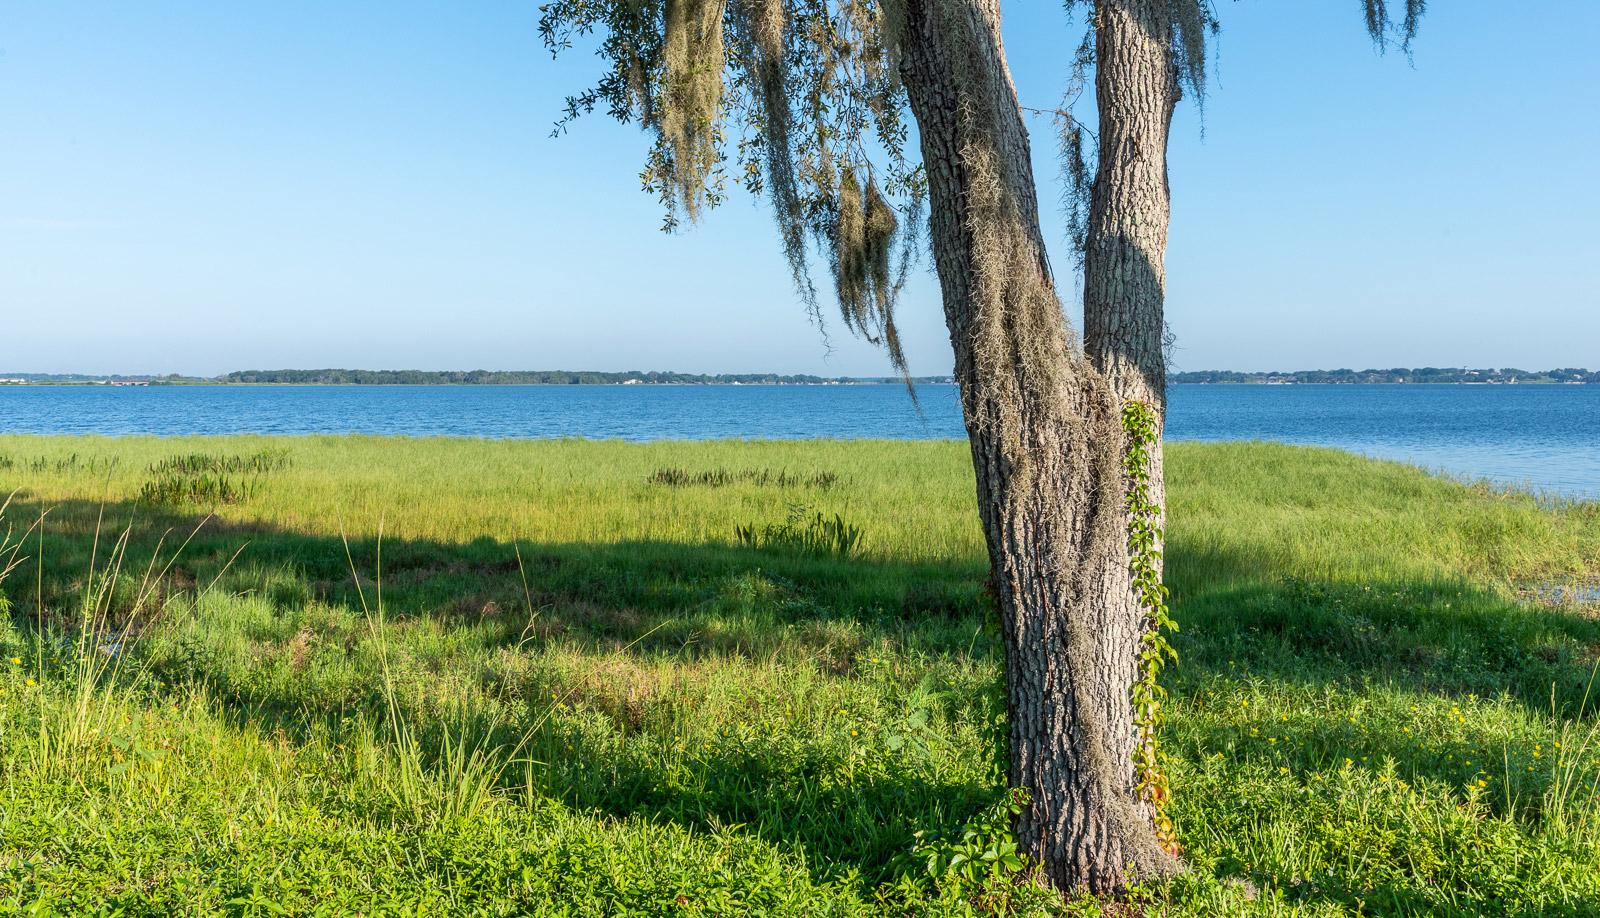 Lake Minneola